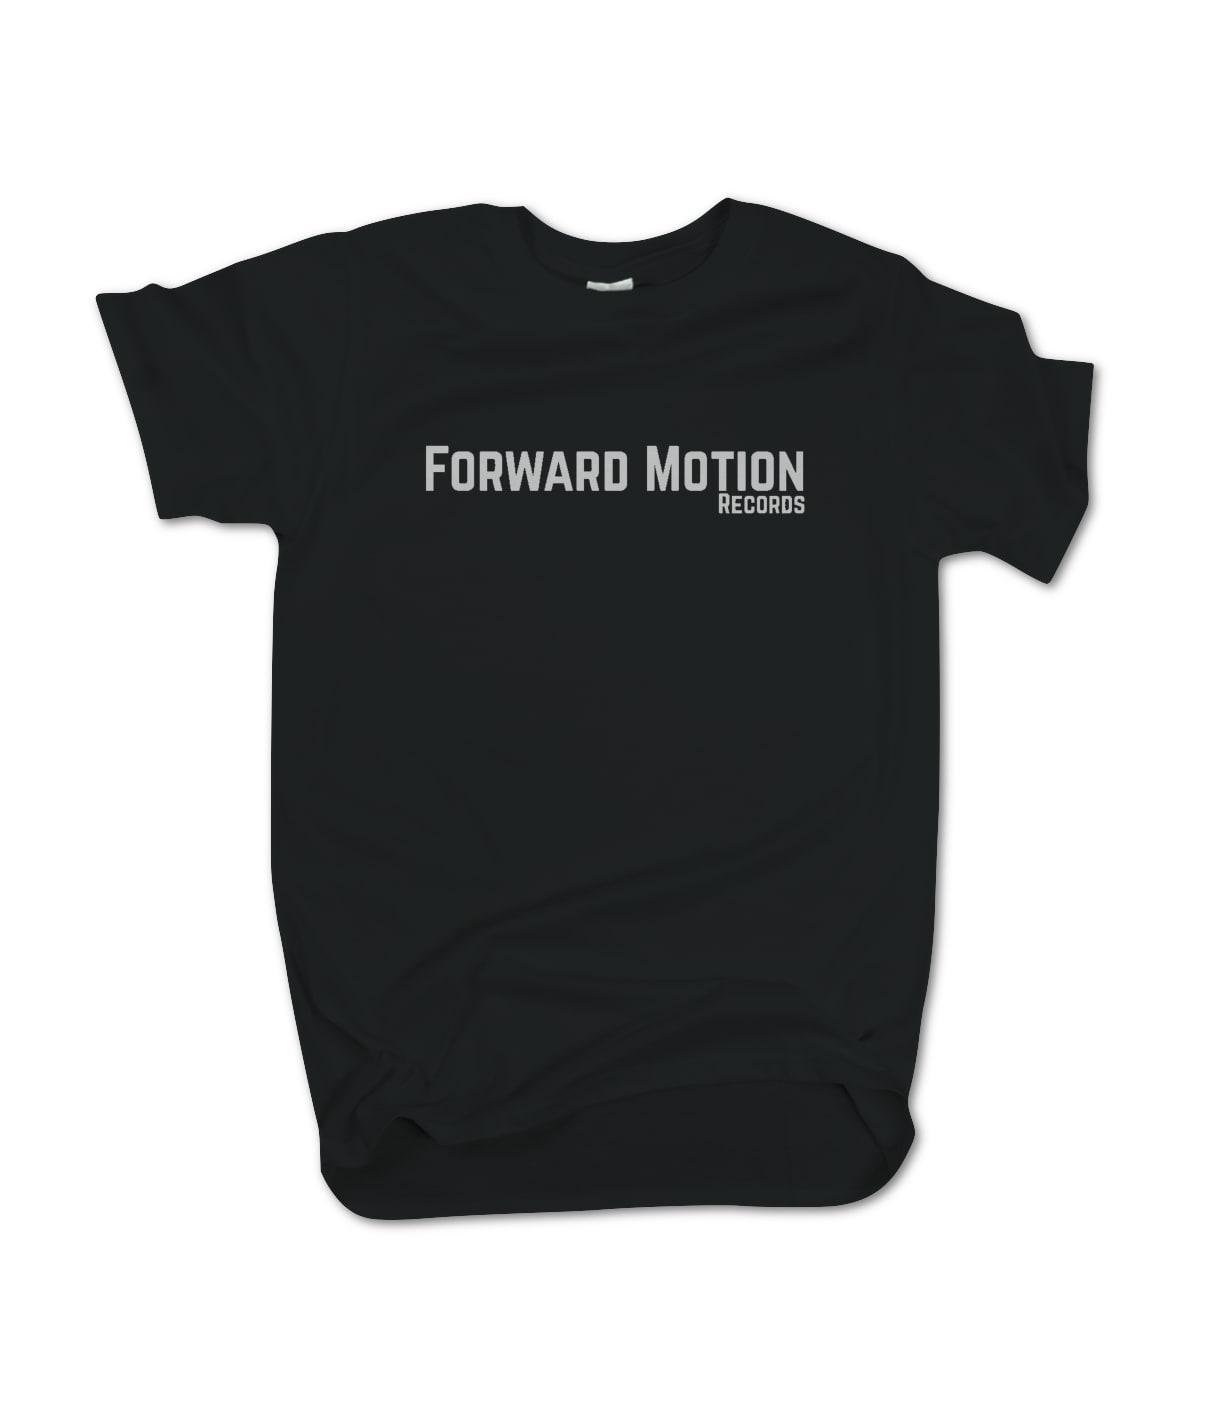 Forward motion records  uk  forward motion basic print 1537437612